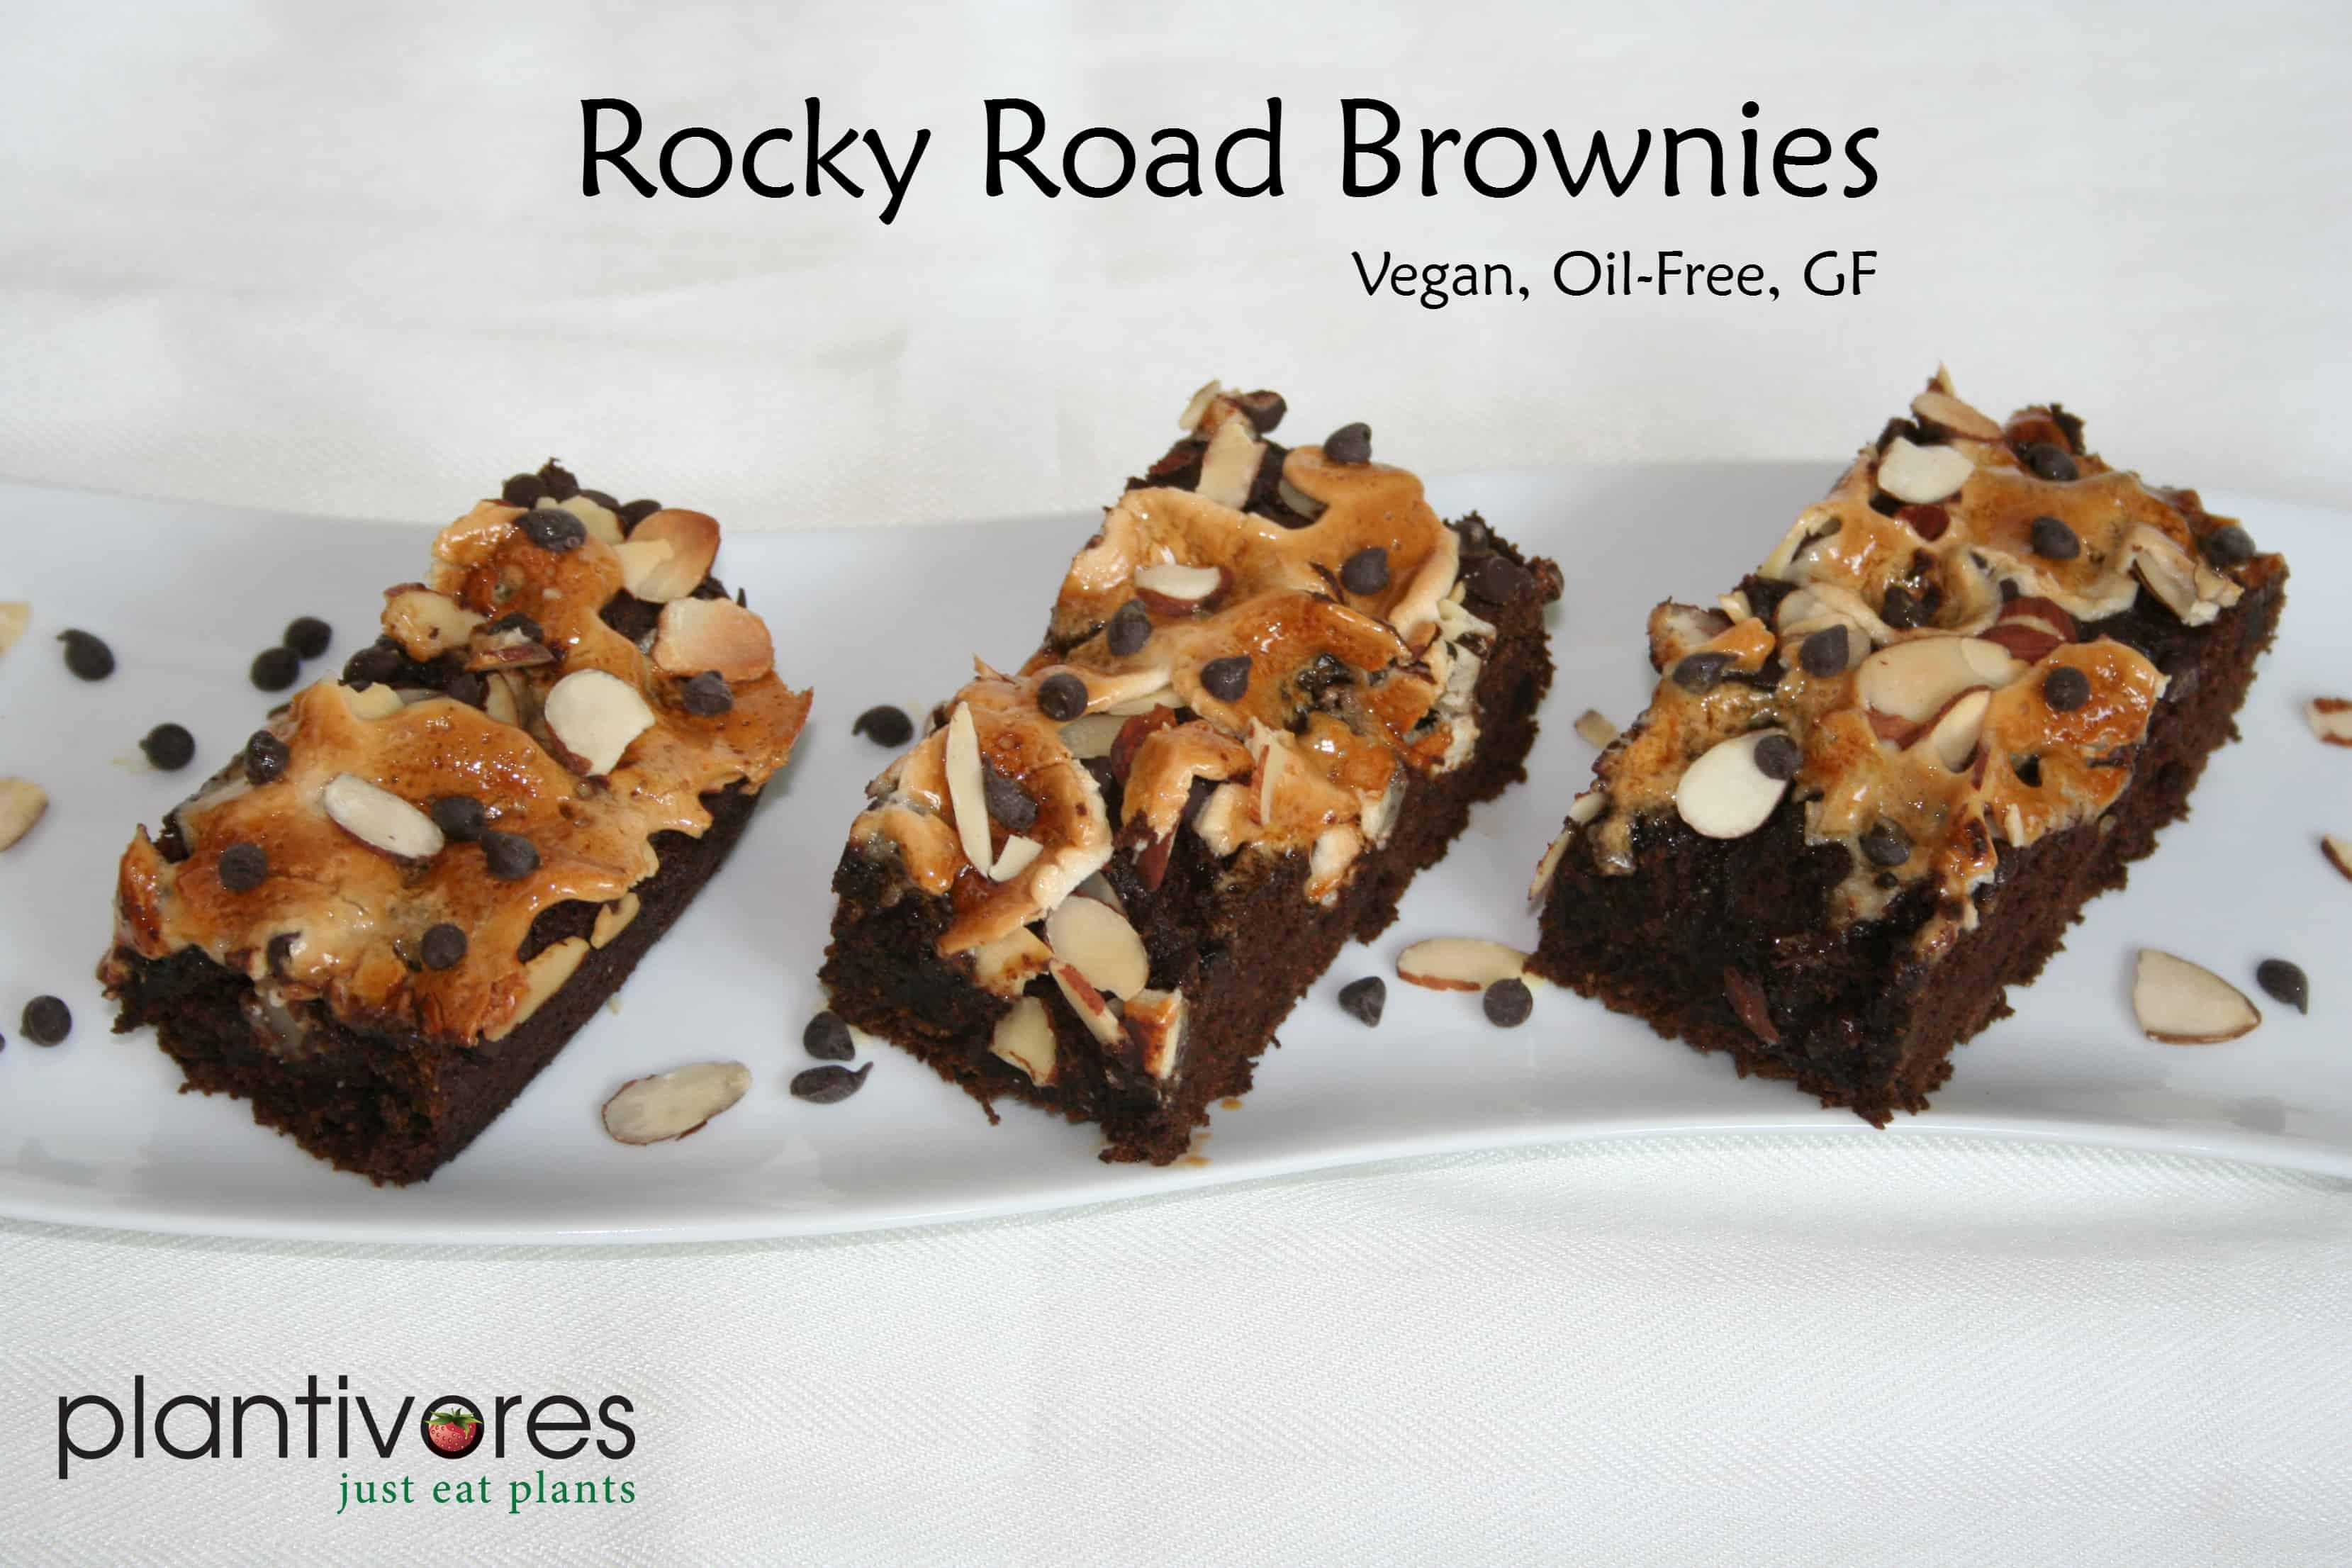 Rocky Road Brownies (Vegan, Oil-Free, Gluten-Free) - Plantivores